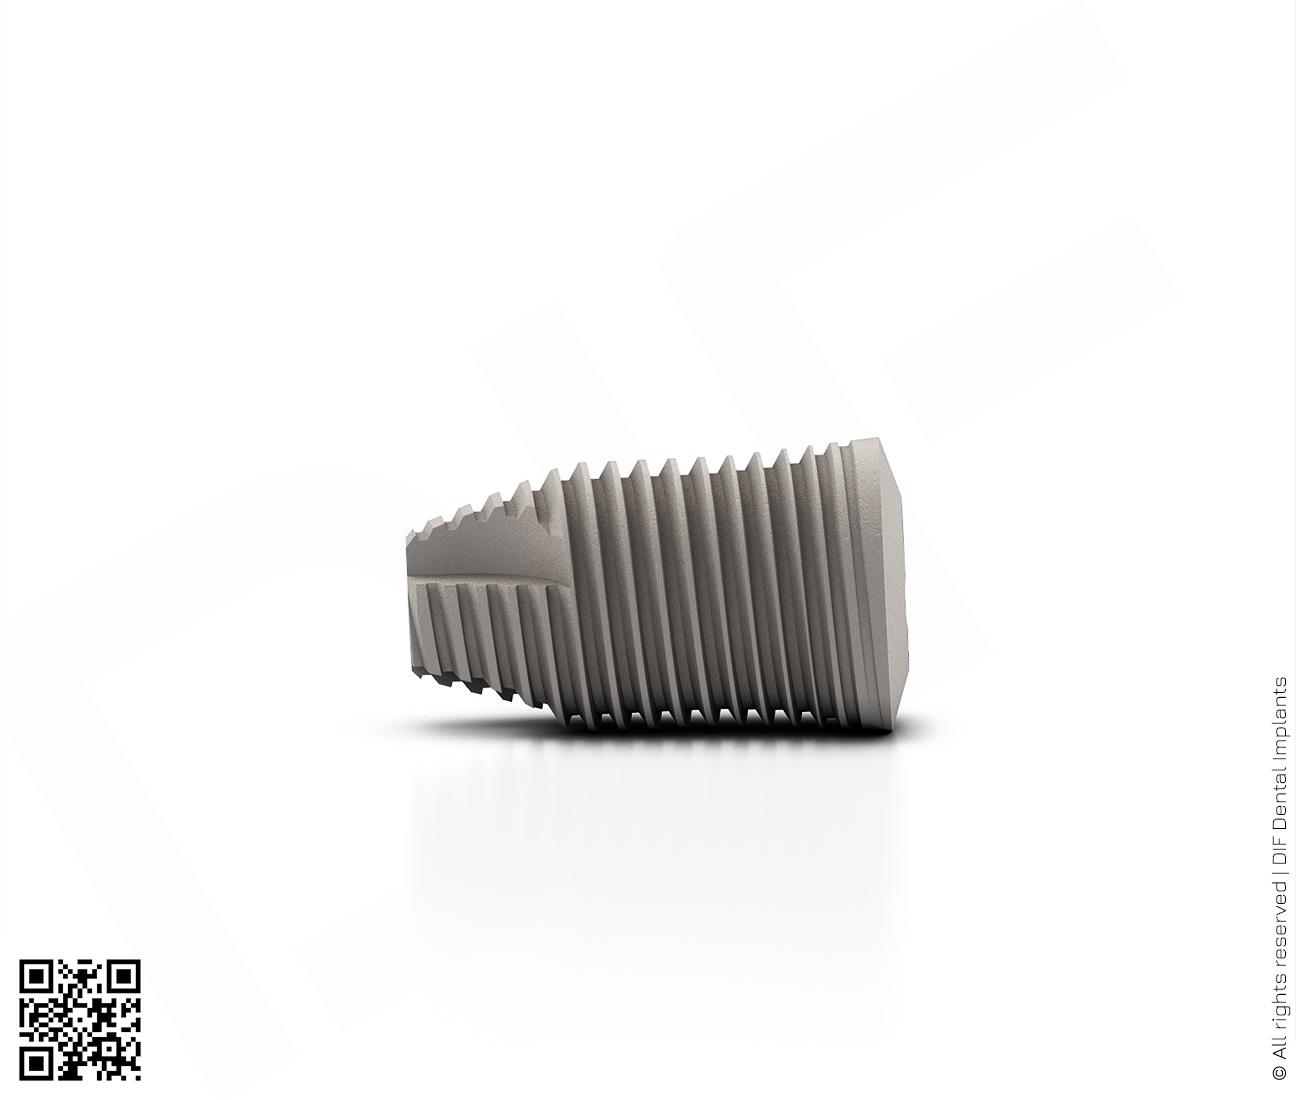 Фото имплантат mainstream fine d6.0 мм – l10.0 мм  производства DIF.